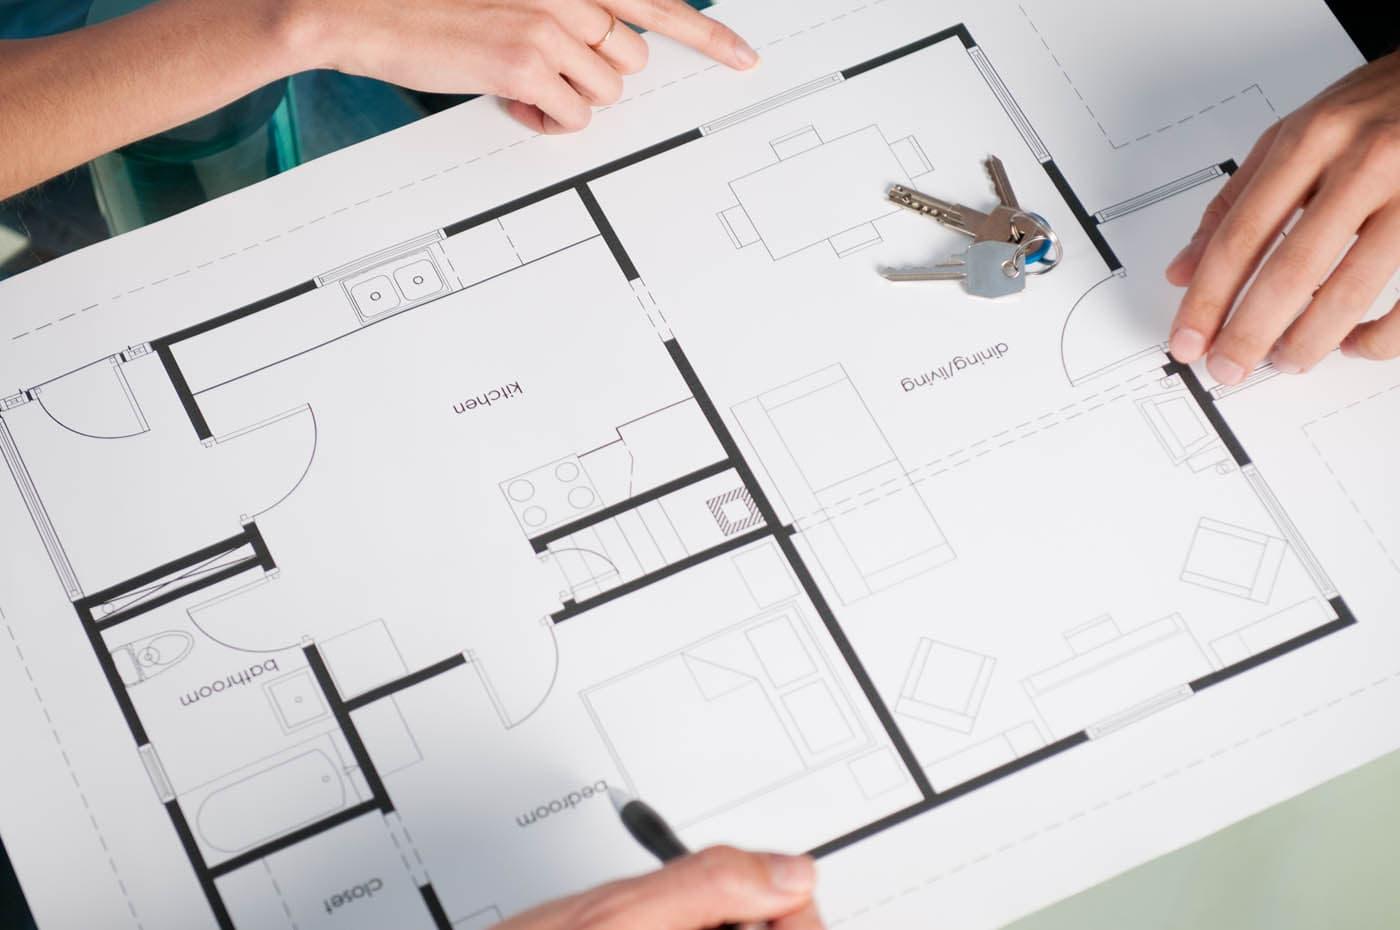 estafa inmobiliaria sobre plano